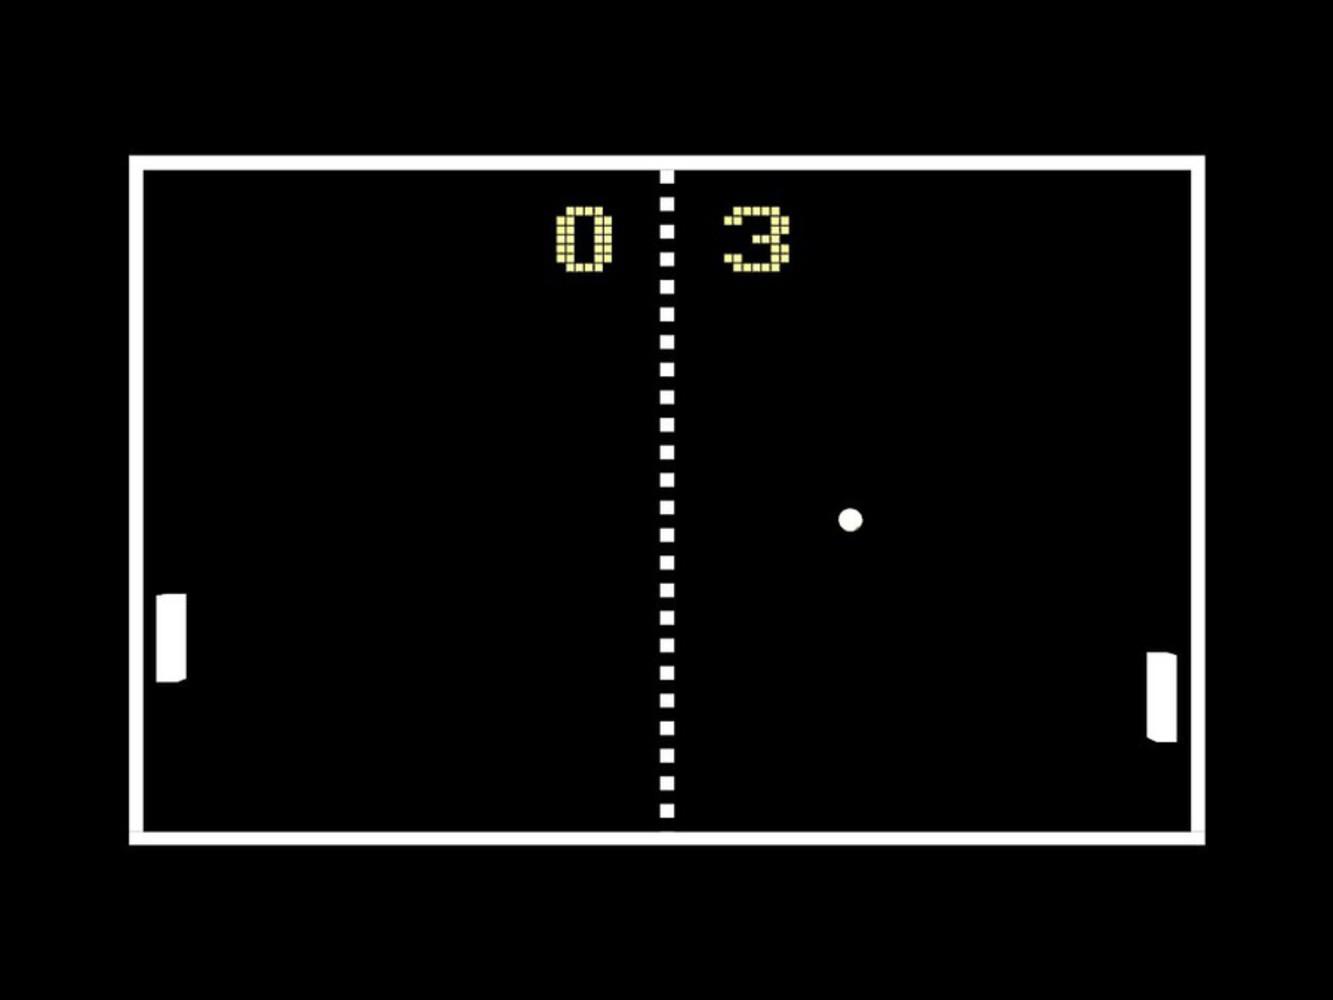 2dbcc300 1359 11e4 9d16 0759e16cb1a6 pong game screenshot.thumb